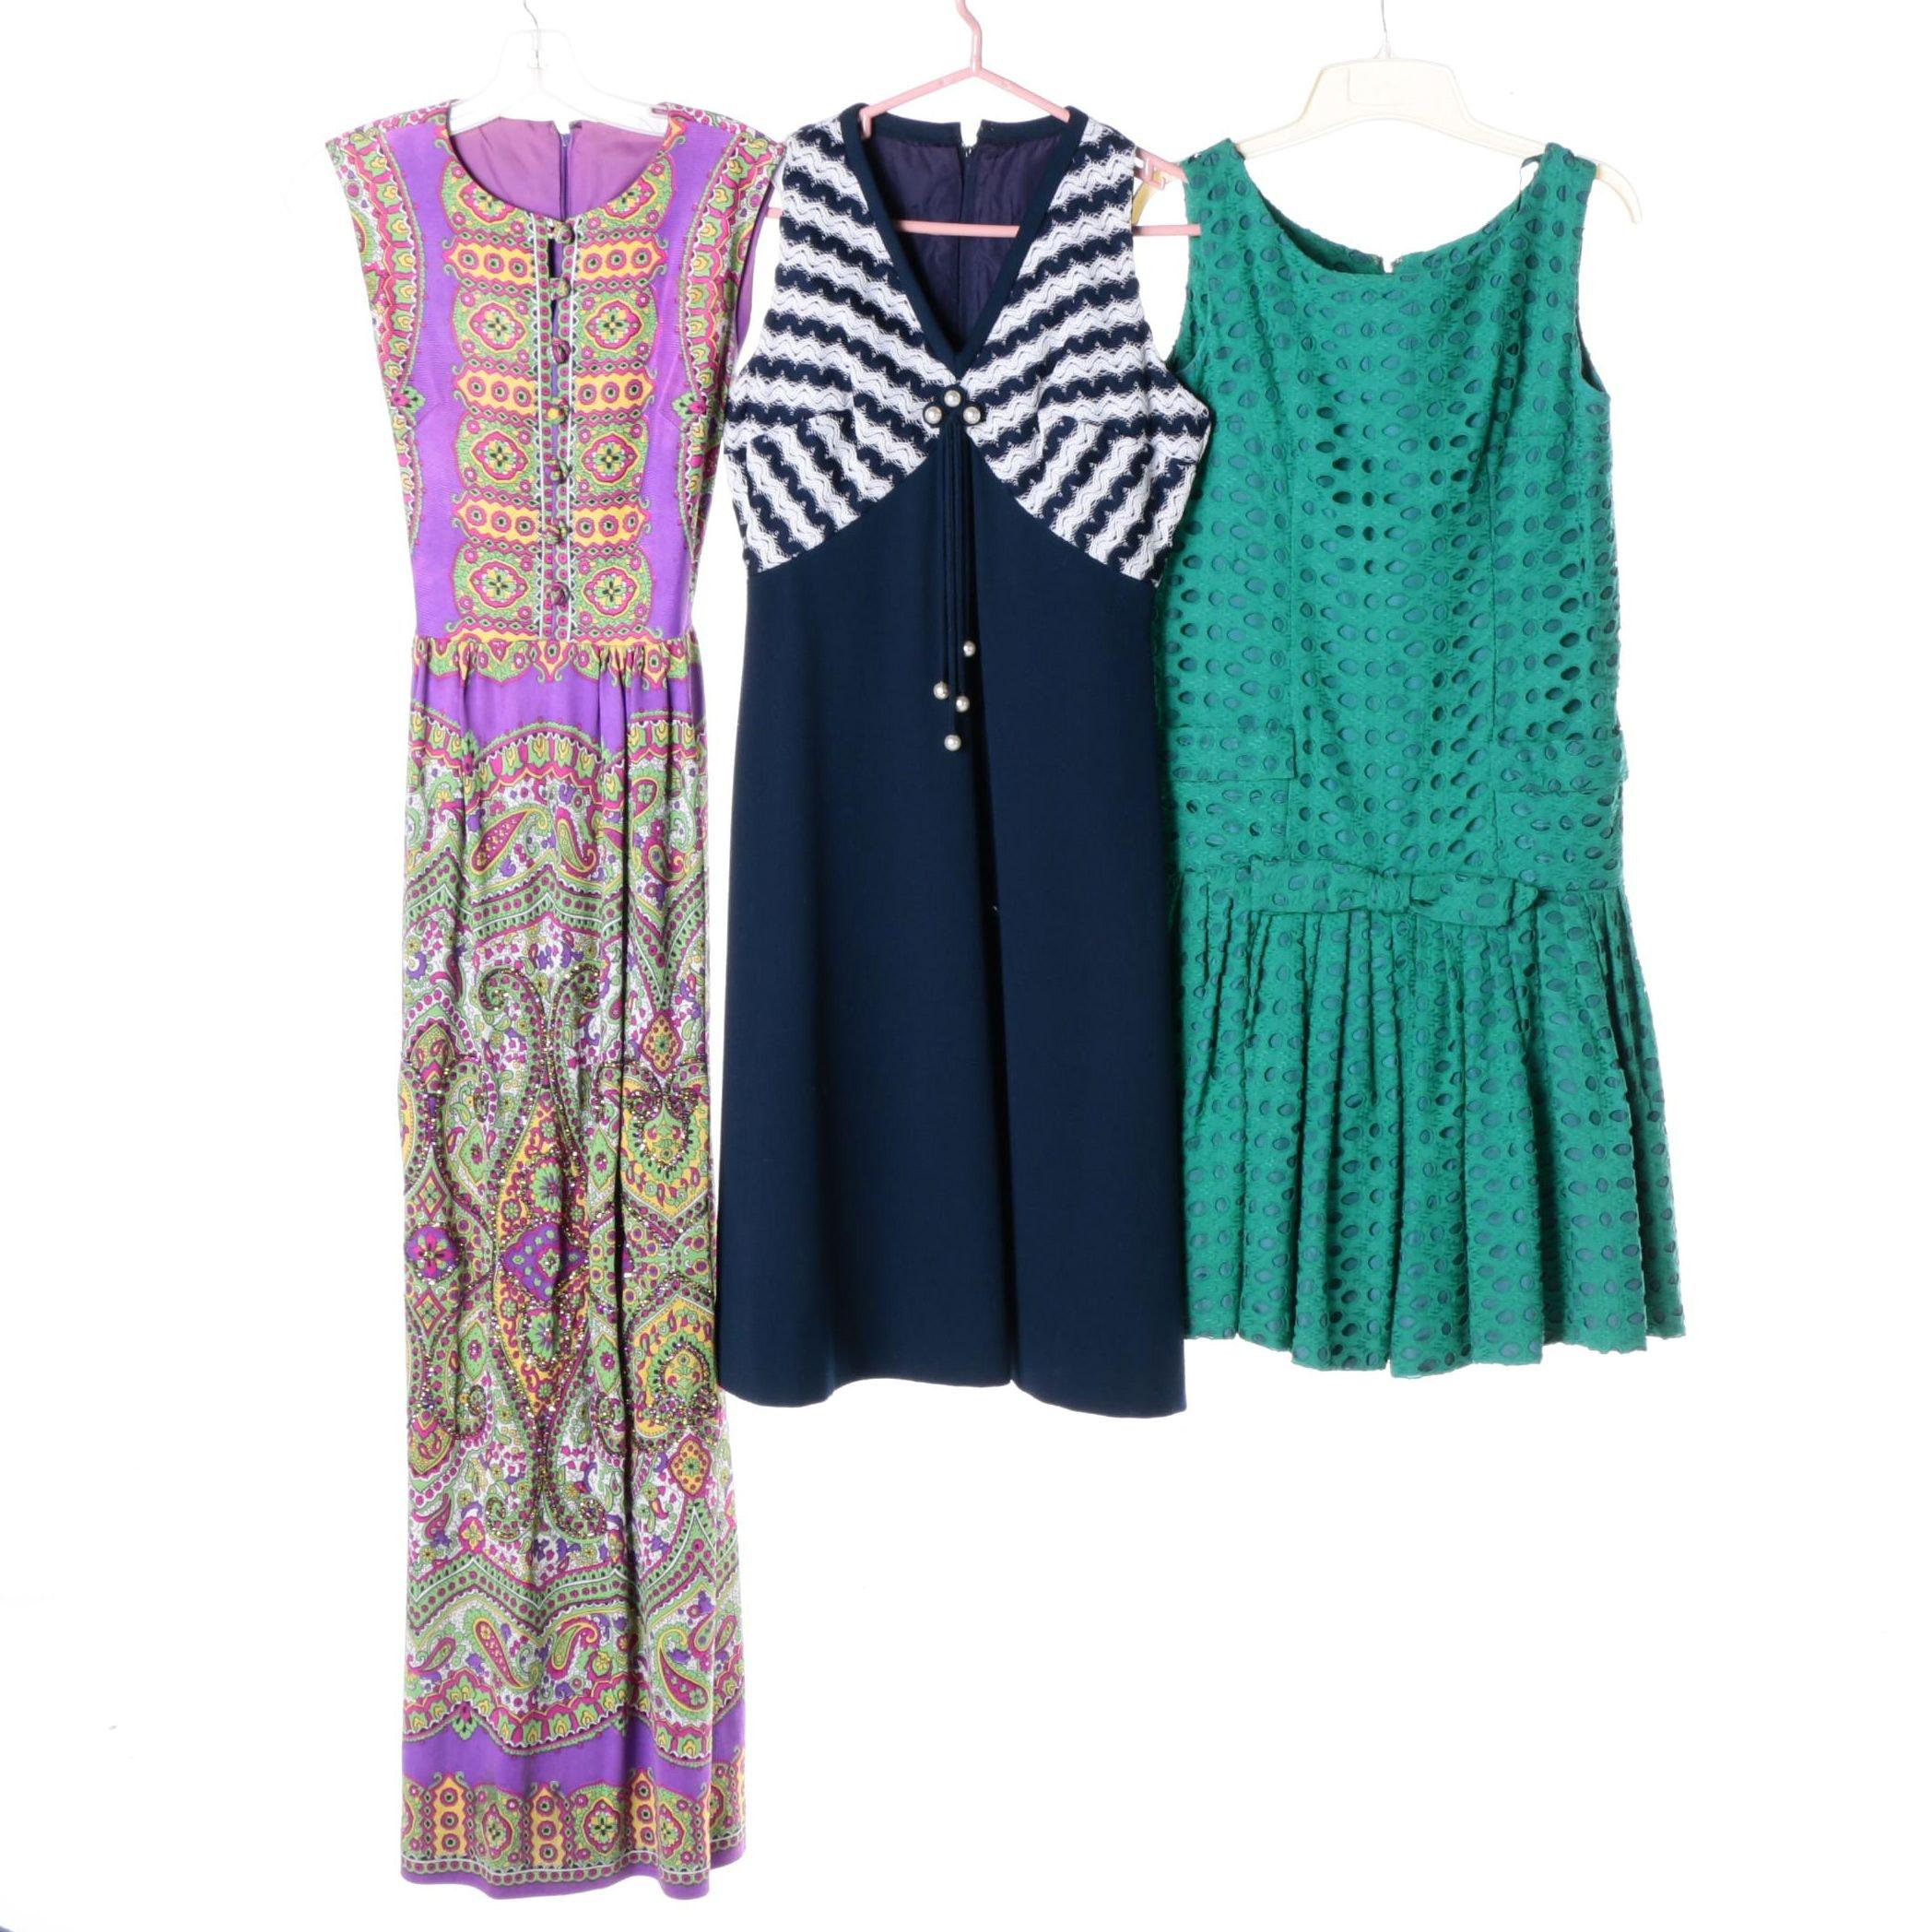 Women's Circa 1970s Vintage Dresses